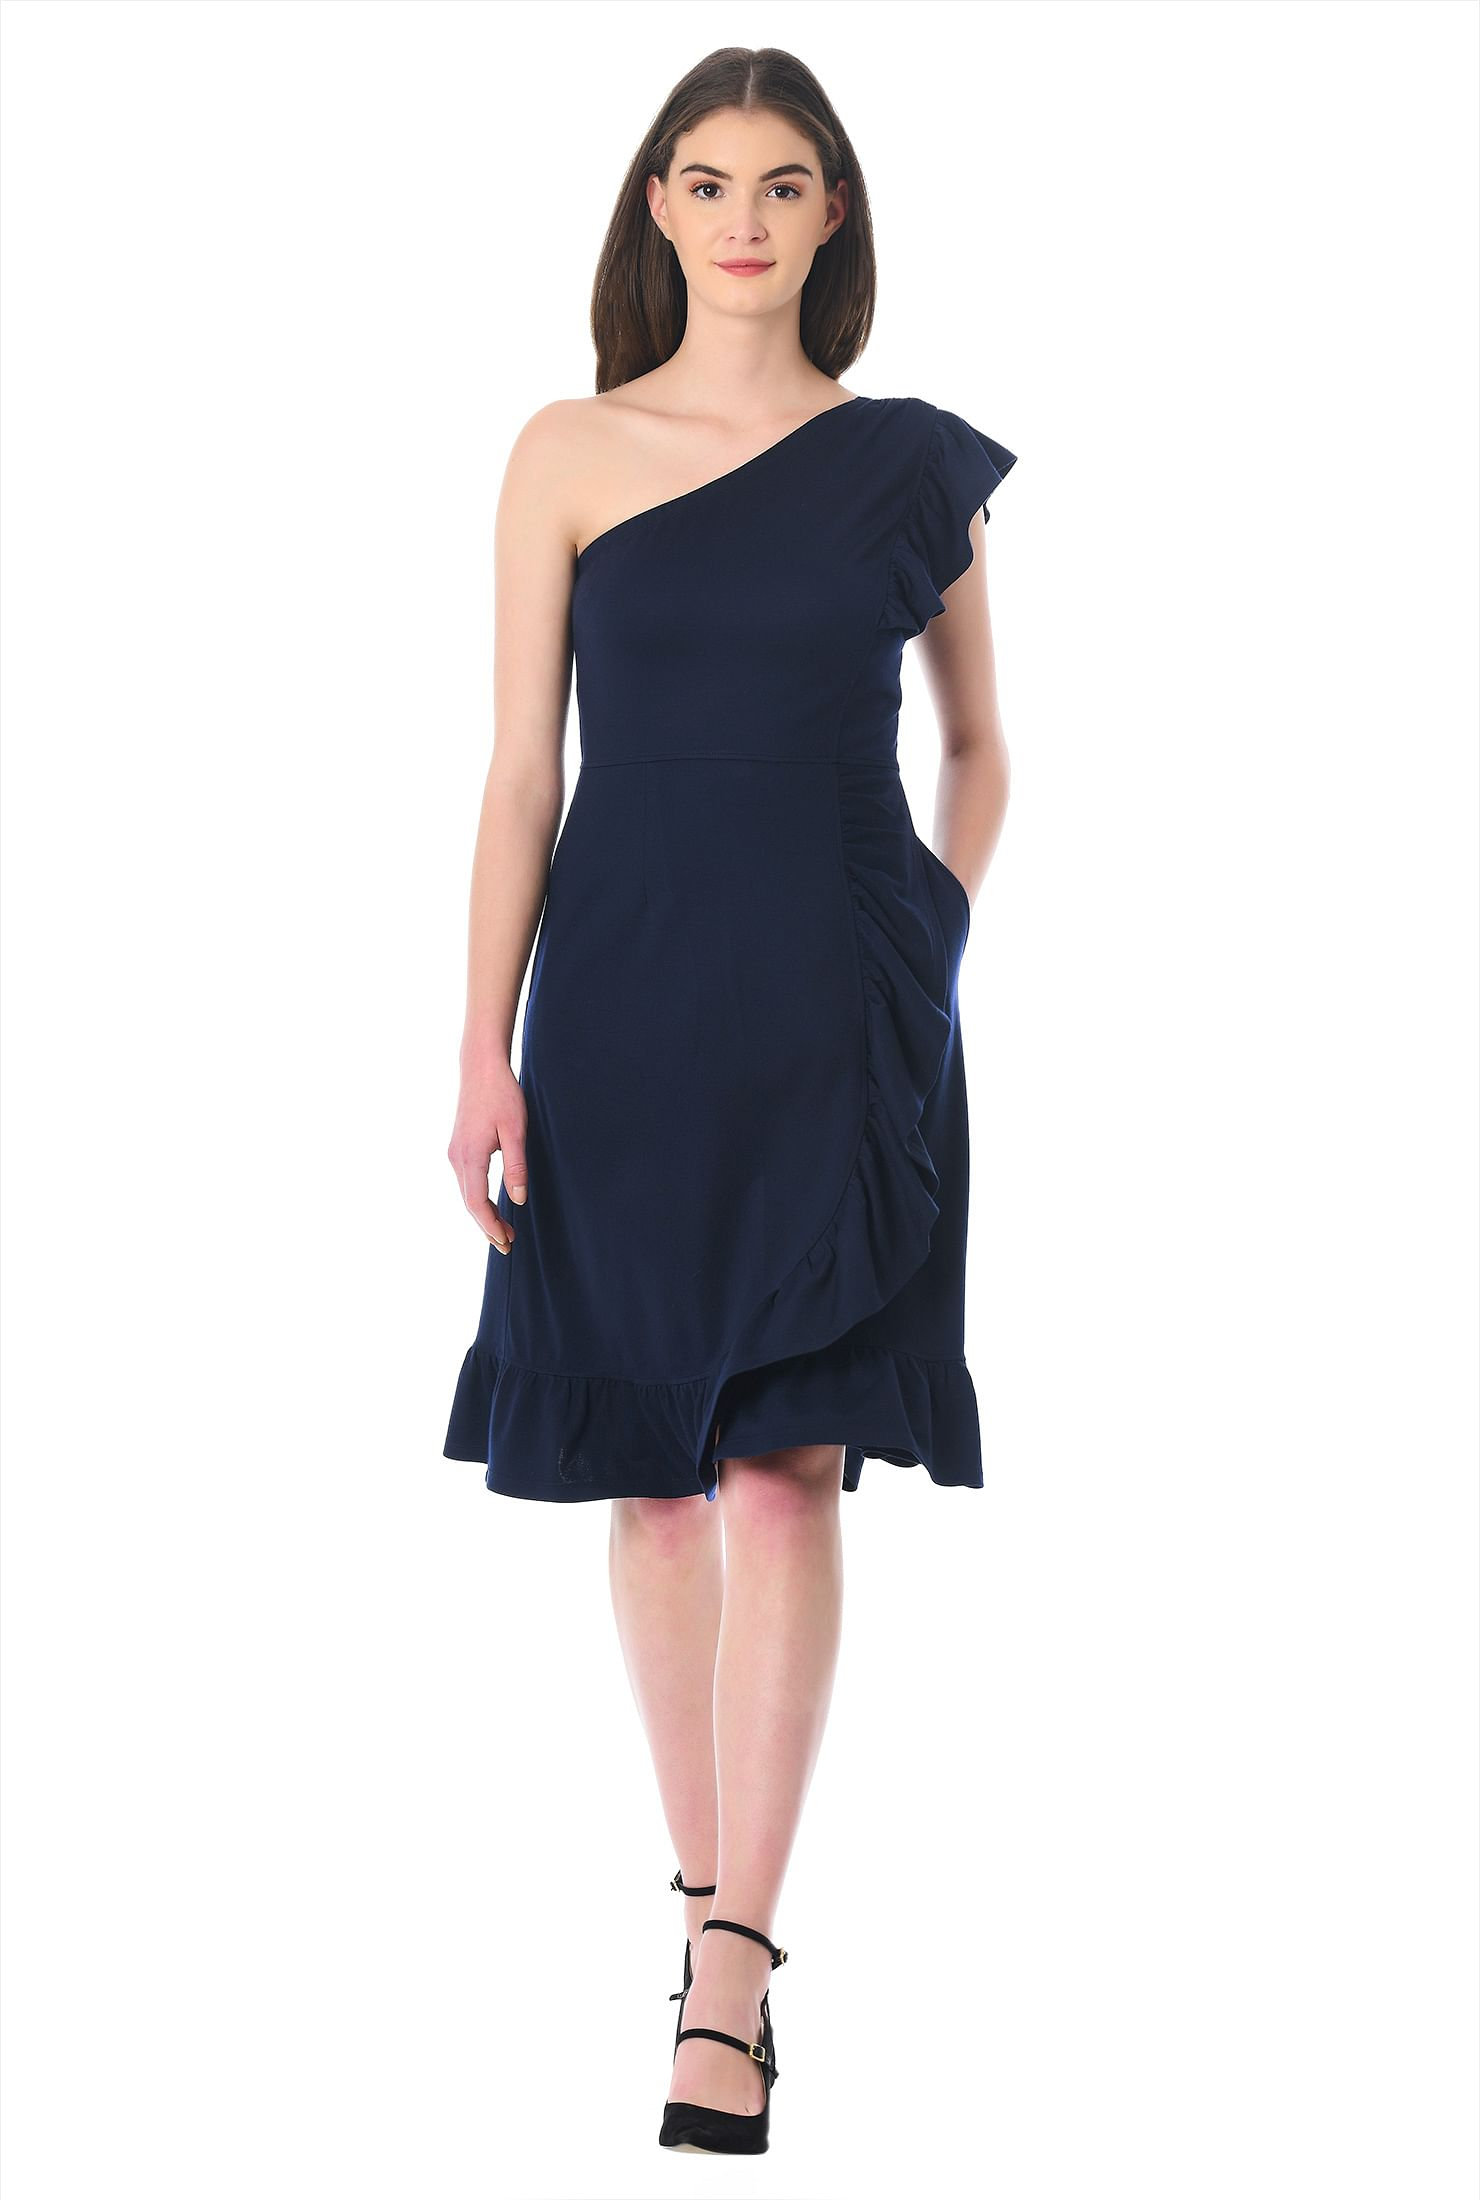 Blue below the Knee Prom Dresses